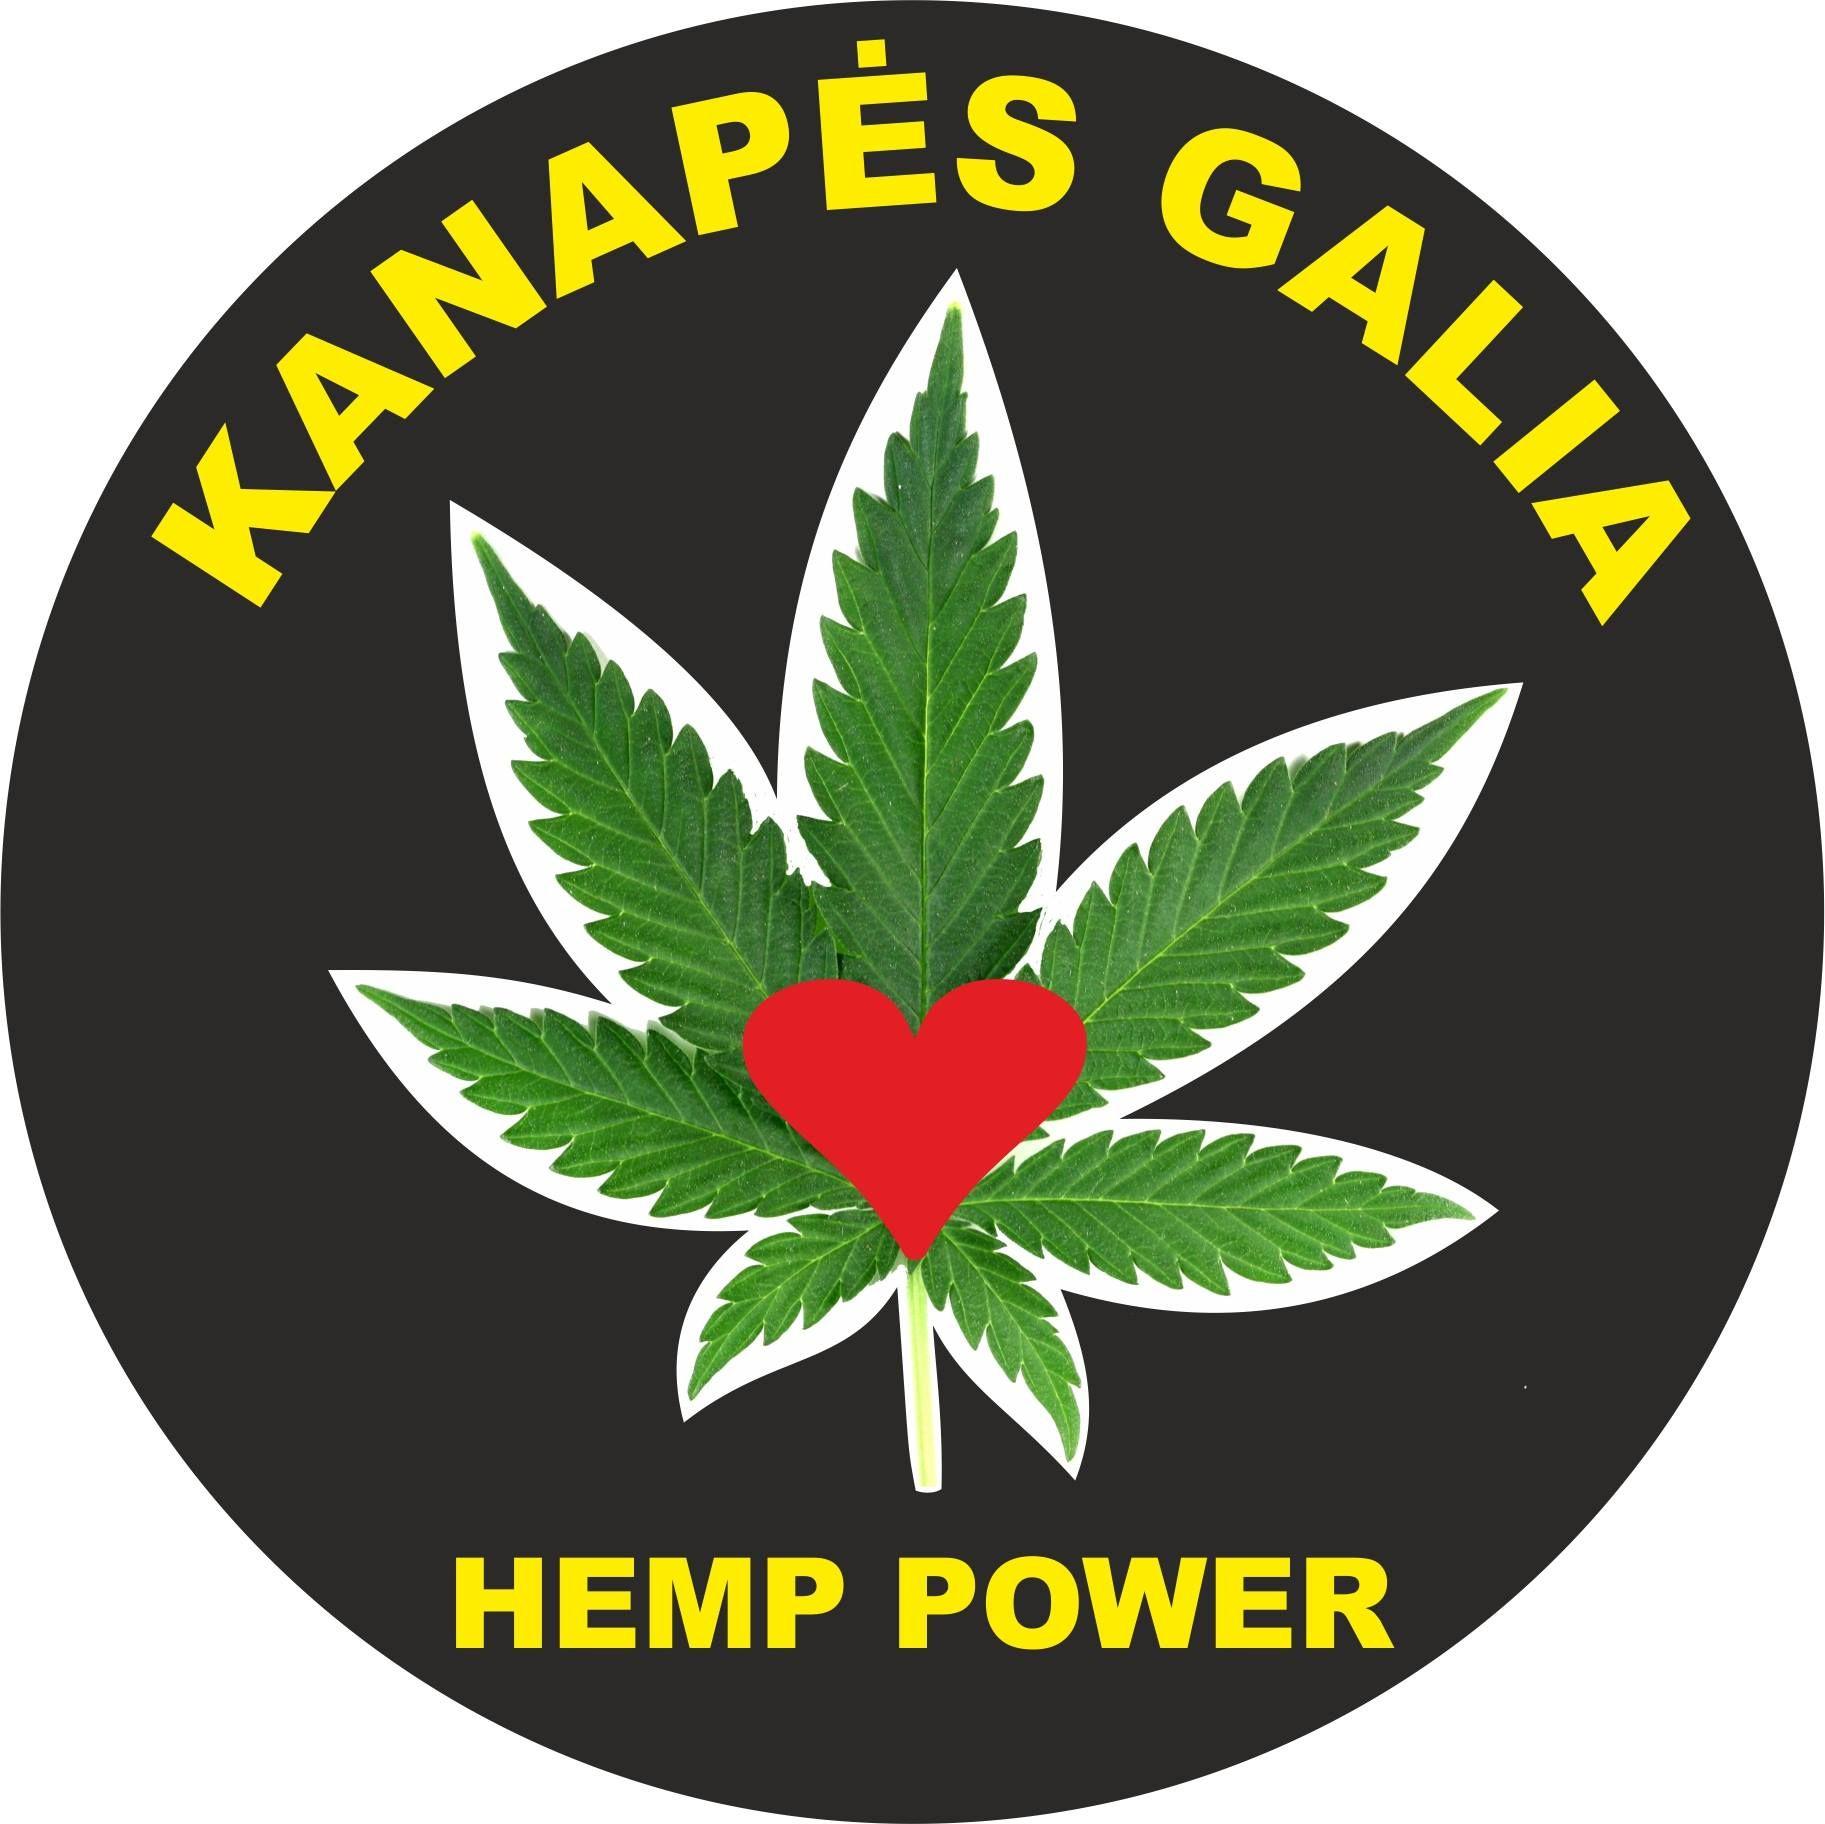 Pin by JAH & Sons on Organic Hemp Buds Tea | Hemp, Cannabis, Tea